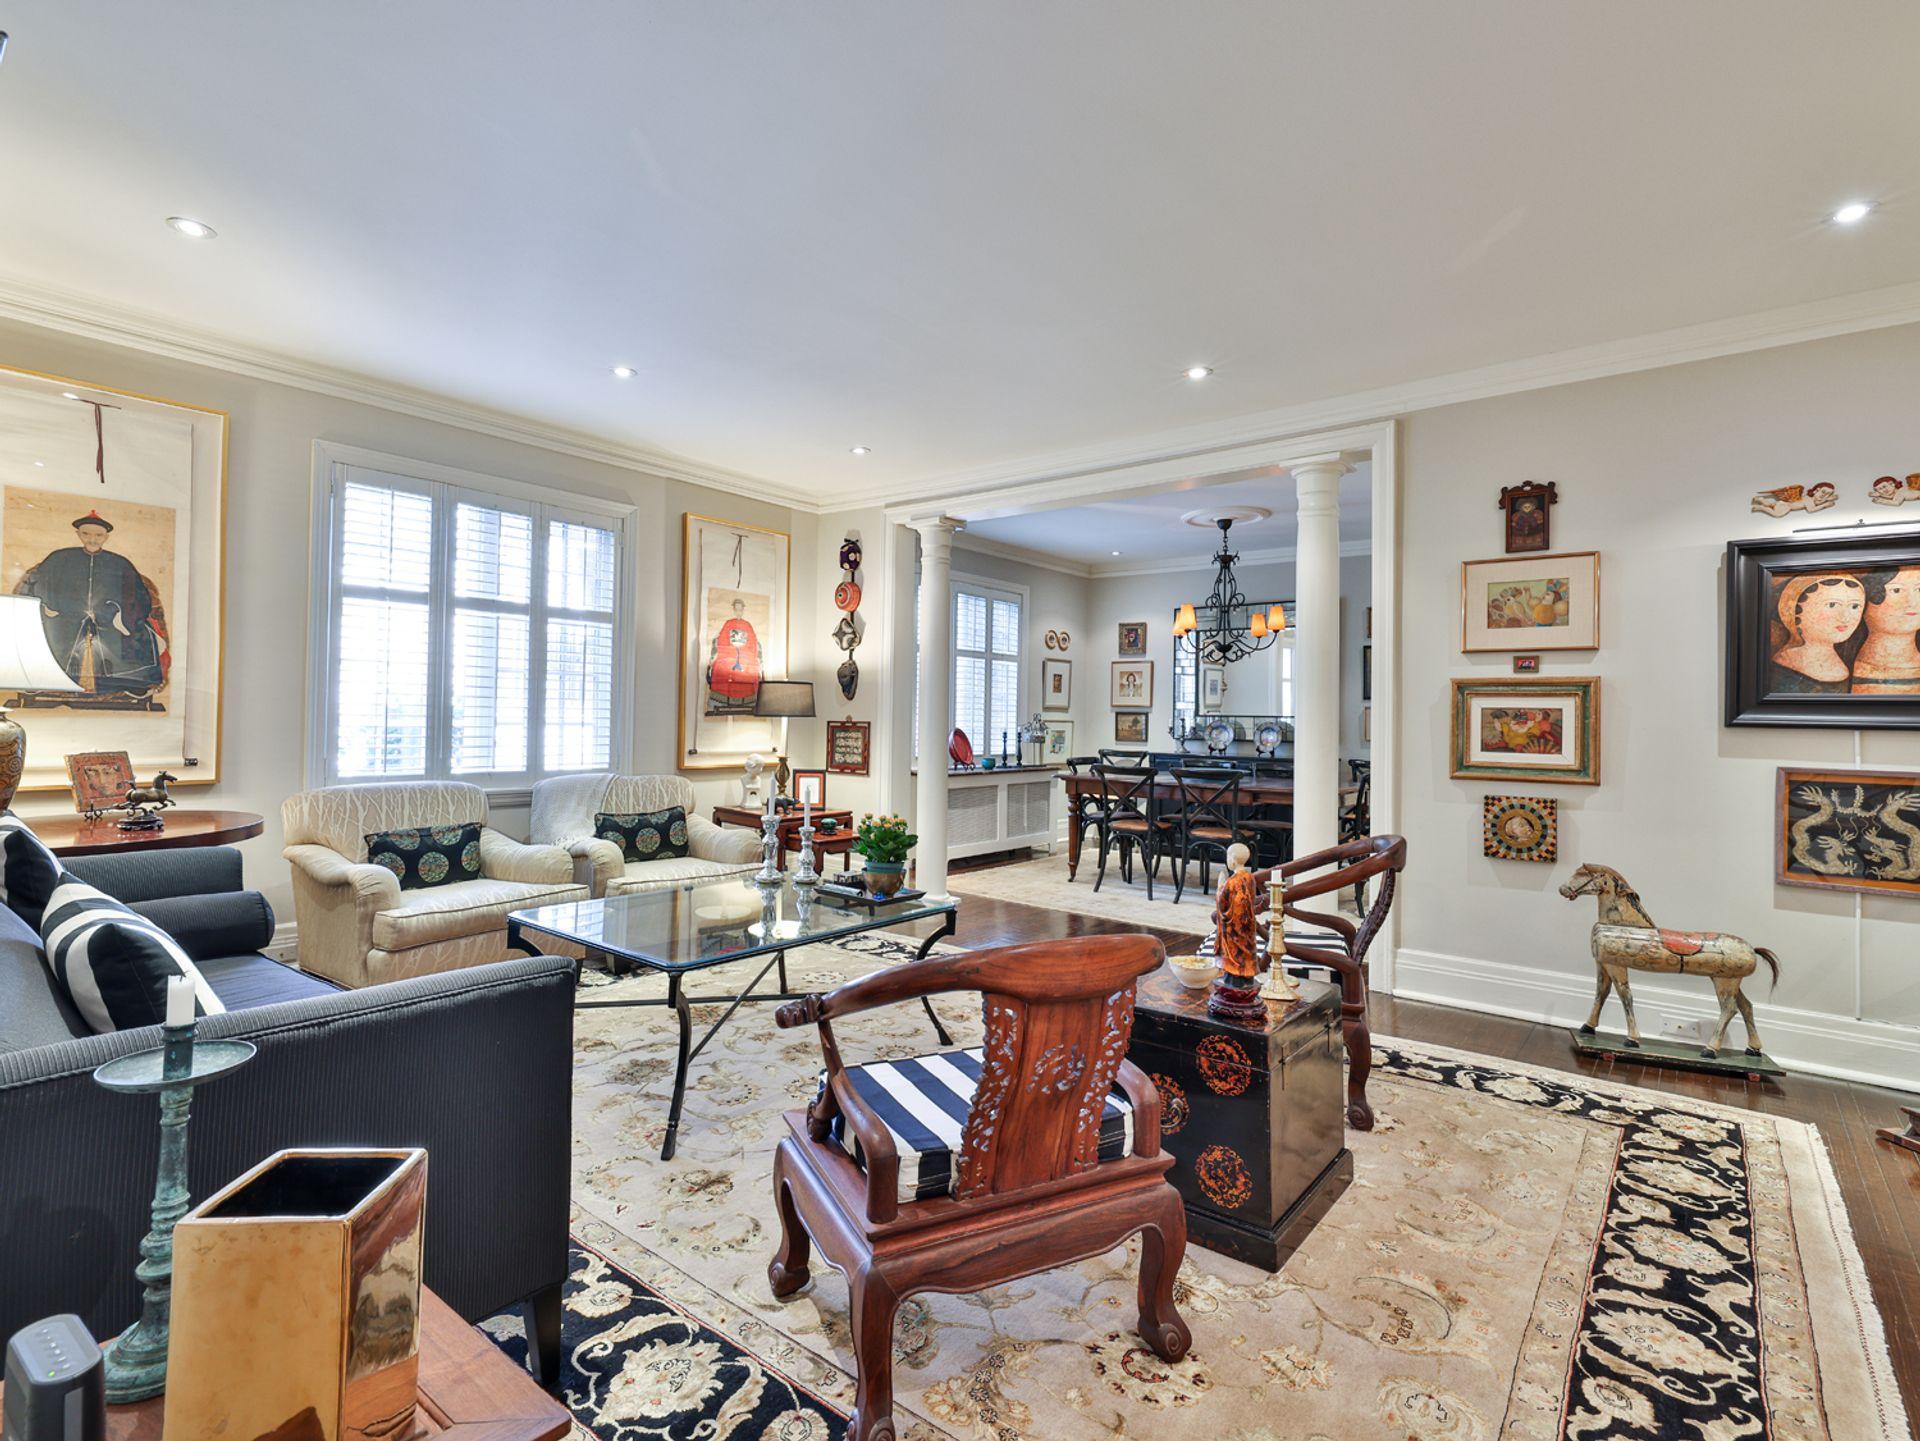 Living Room at 305 - 150 St. Clair Avenue W, Yonge-St. Clair, Toronto